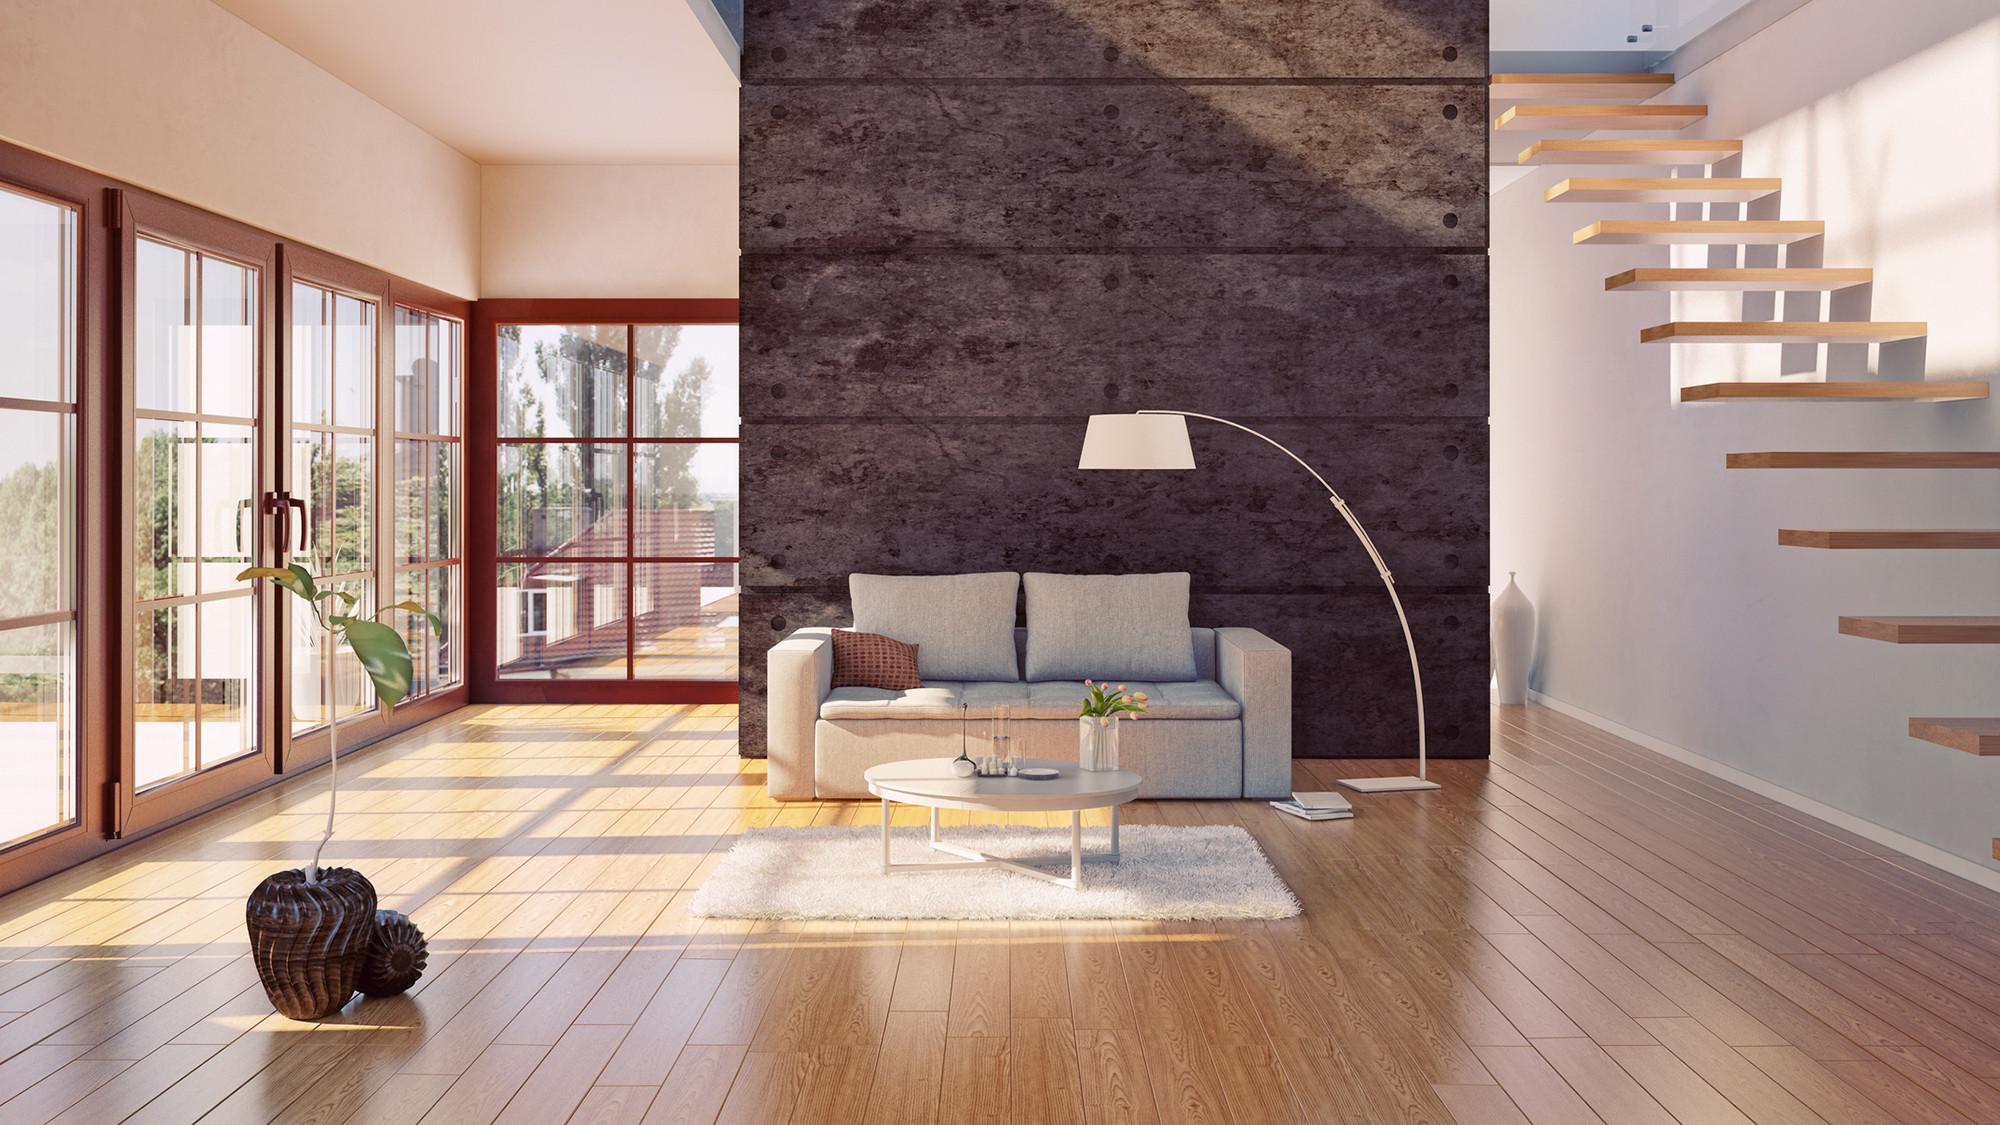 resurfacing prefinished hardwood floors of do hardwood floors provide the best return on investment realtor coma with hardwood floors investment